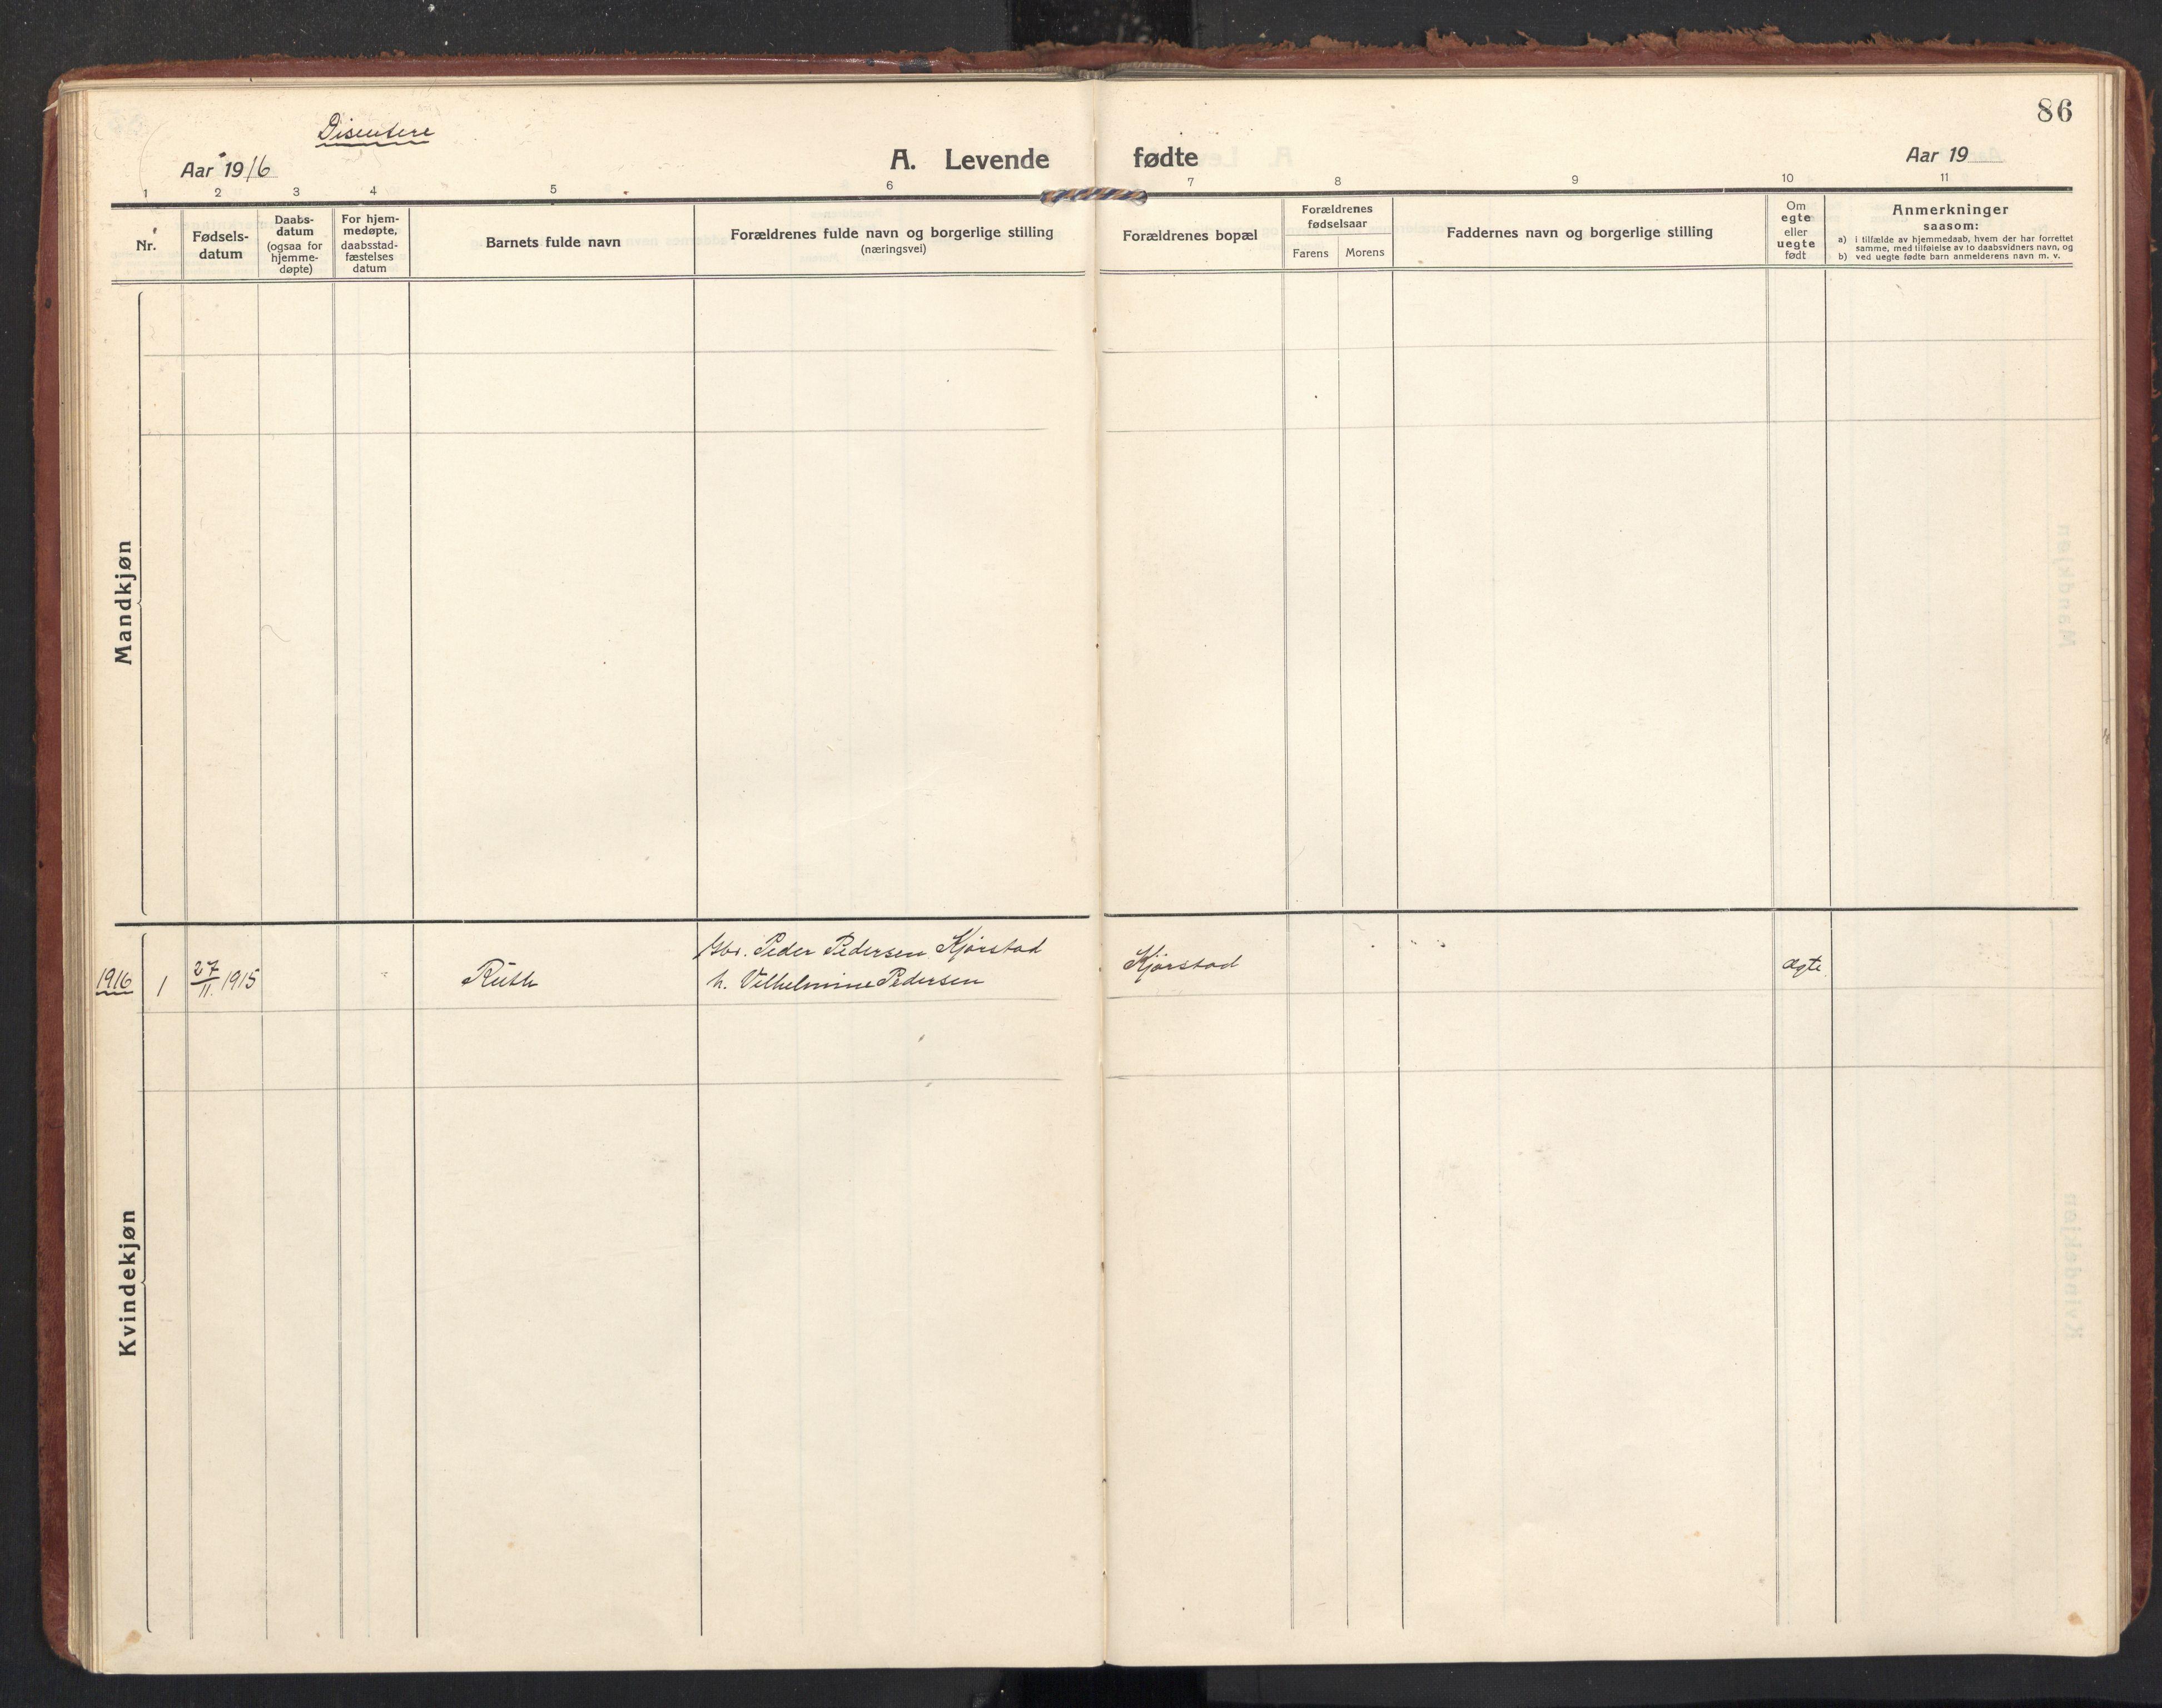 SAT, Ministerialprotokoller, klokkerbøker og fødselsregistre - Nordland, 890/L1288: Ministerialbok nr. 890A03, 1915-1925, s. 86